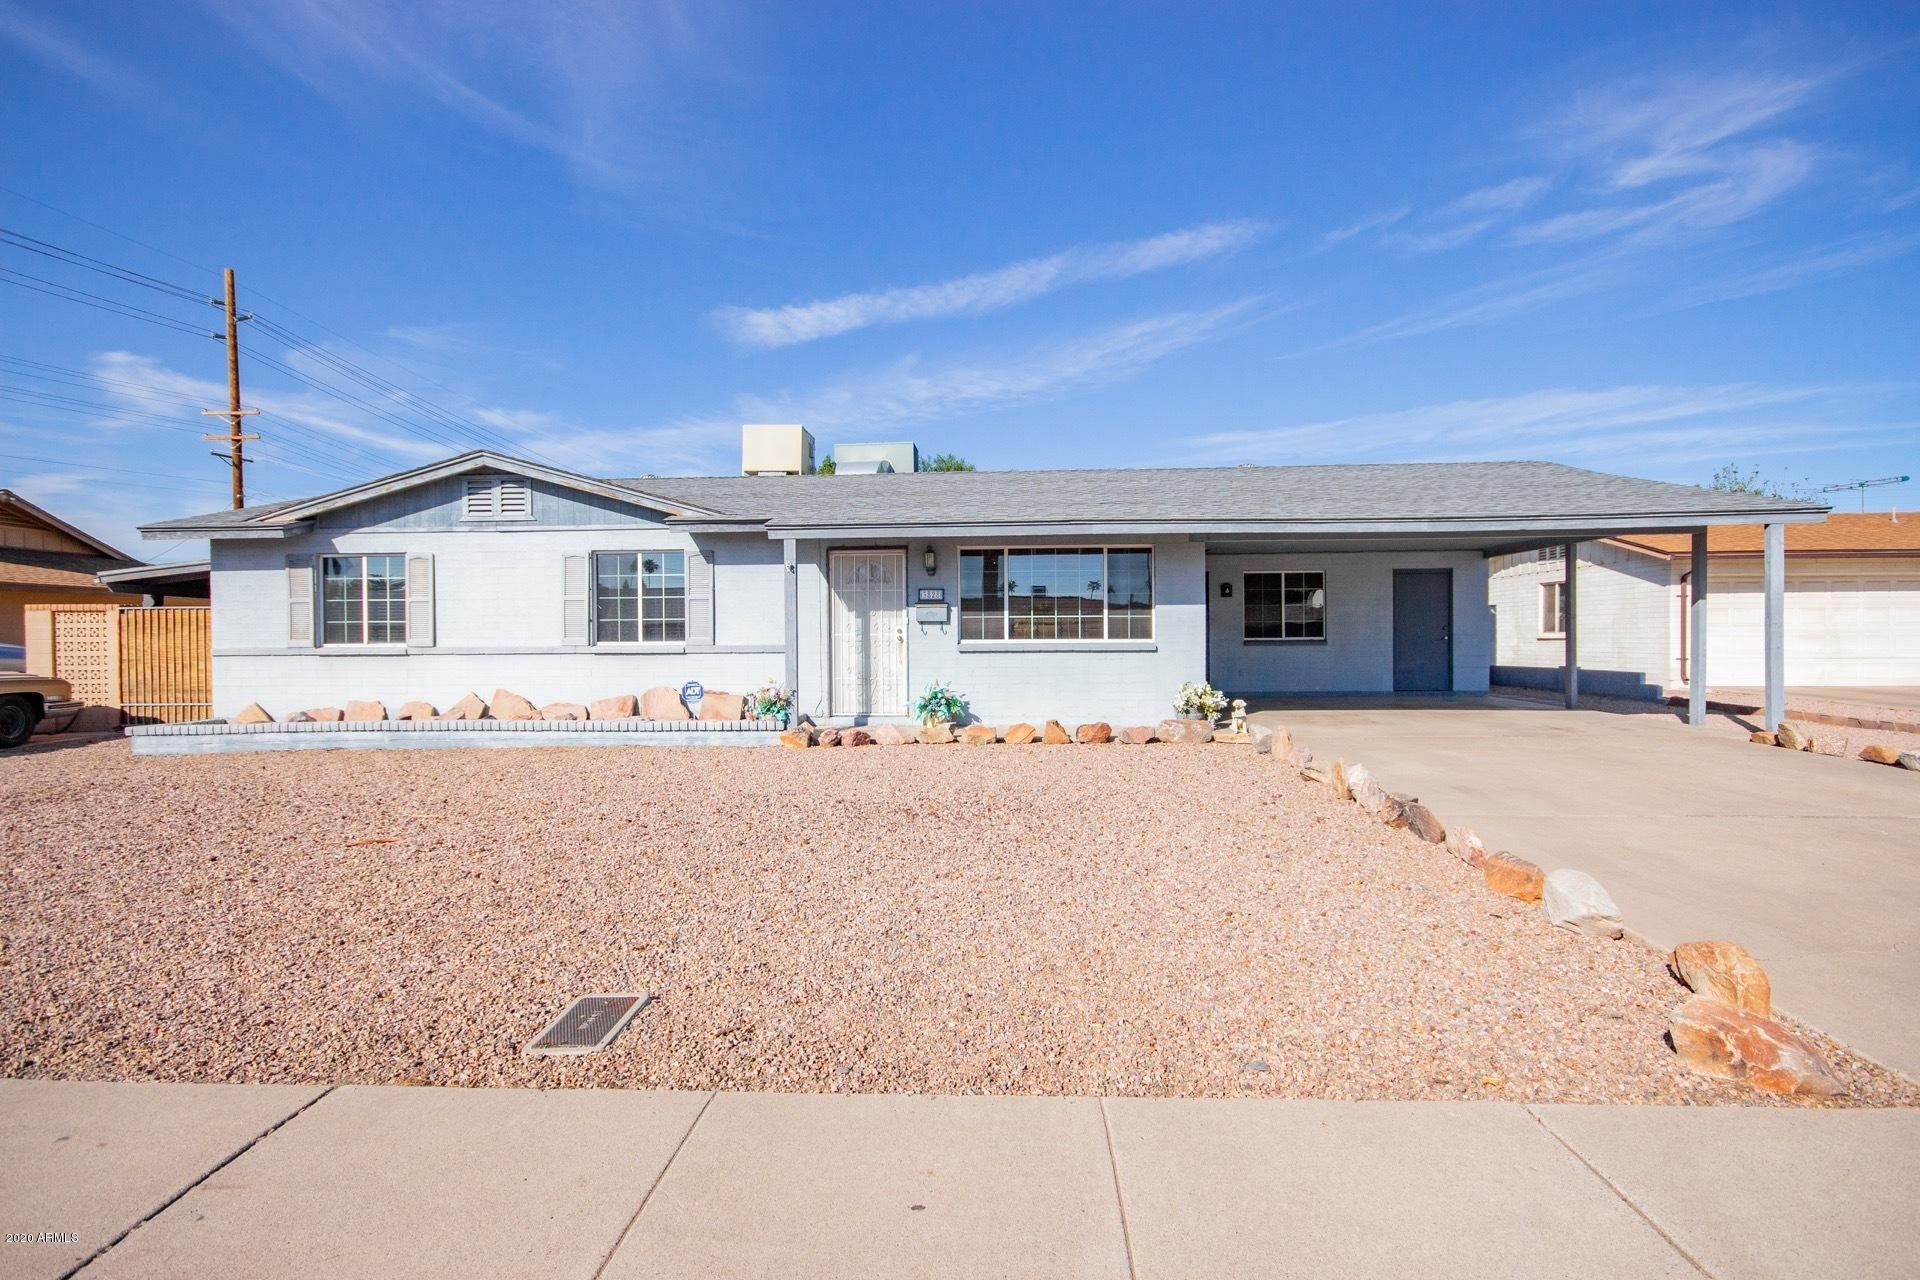 3828 W HAYWARD Avenue, Phoenix, AZ 85051 - MLS#: 6163242